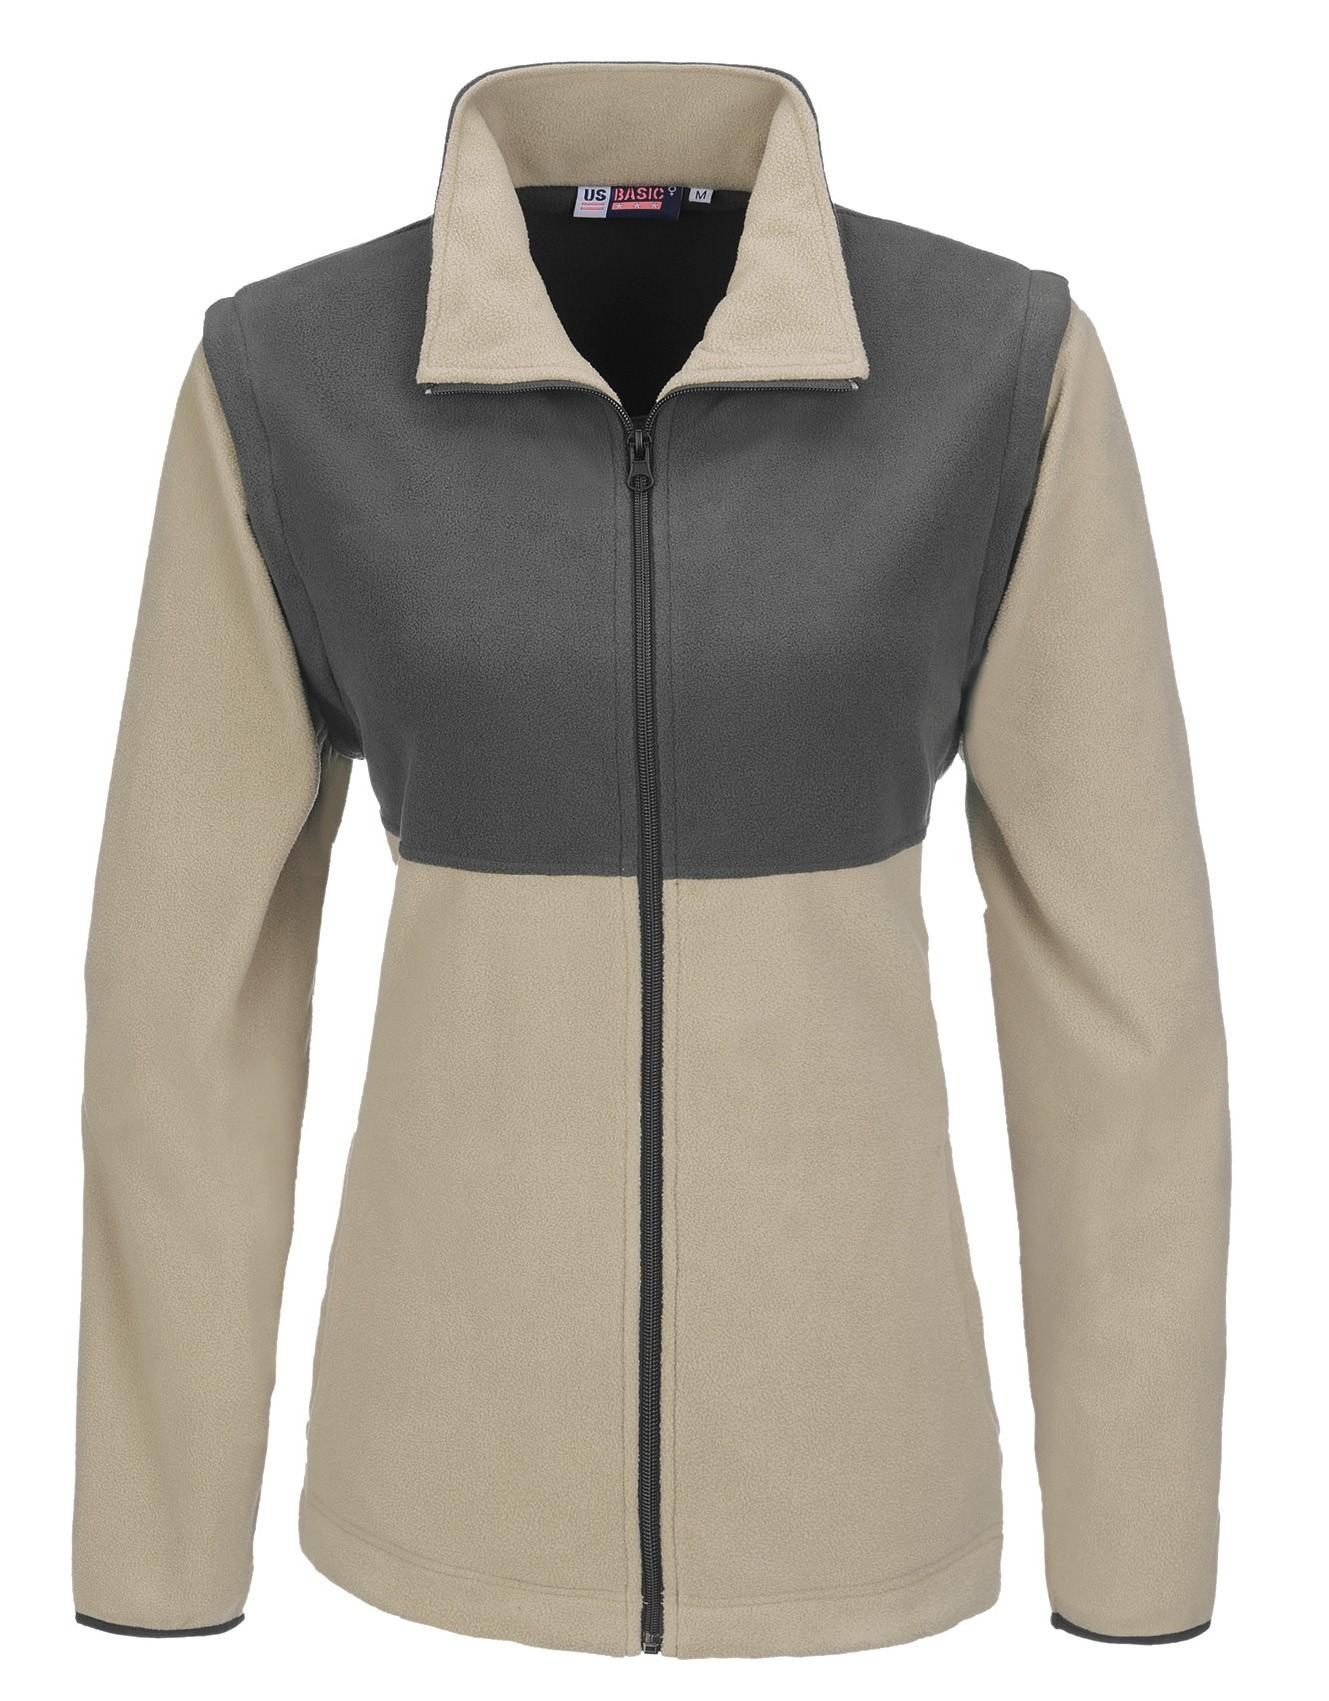 Ladies Benneton Zip-off Micro Fleece Jacket - Khaki Only